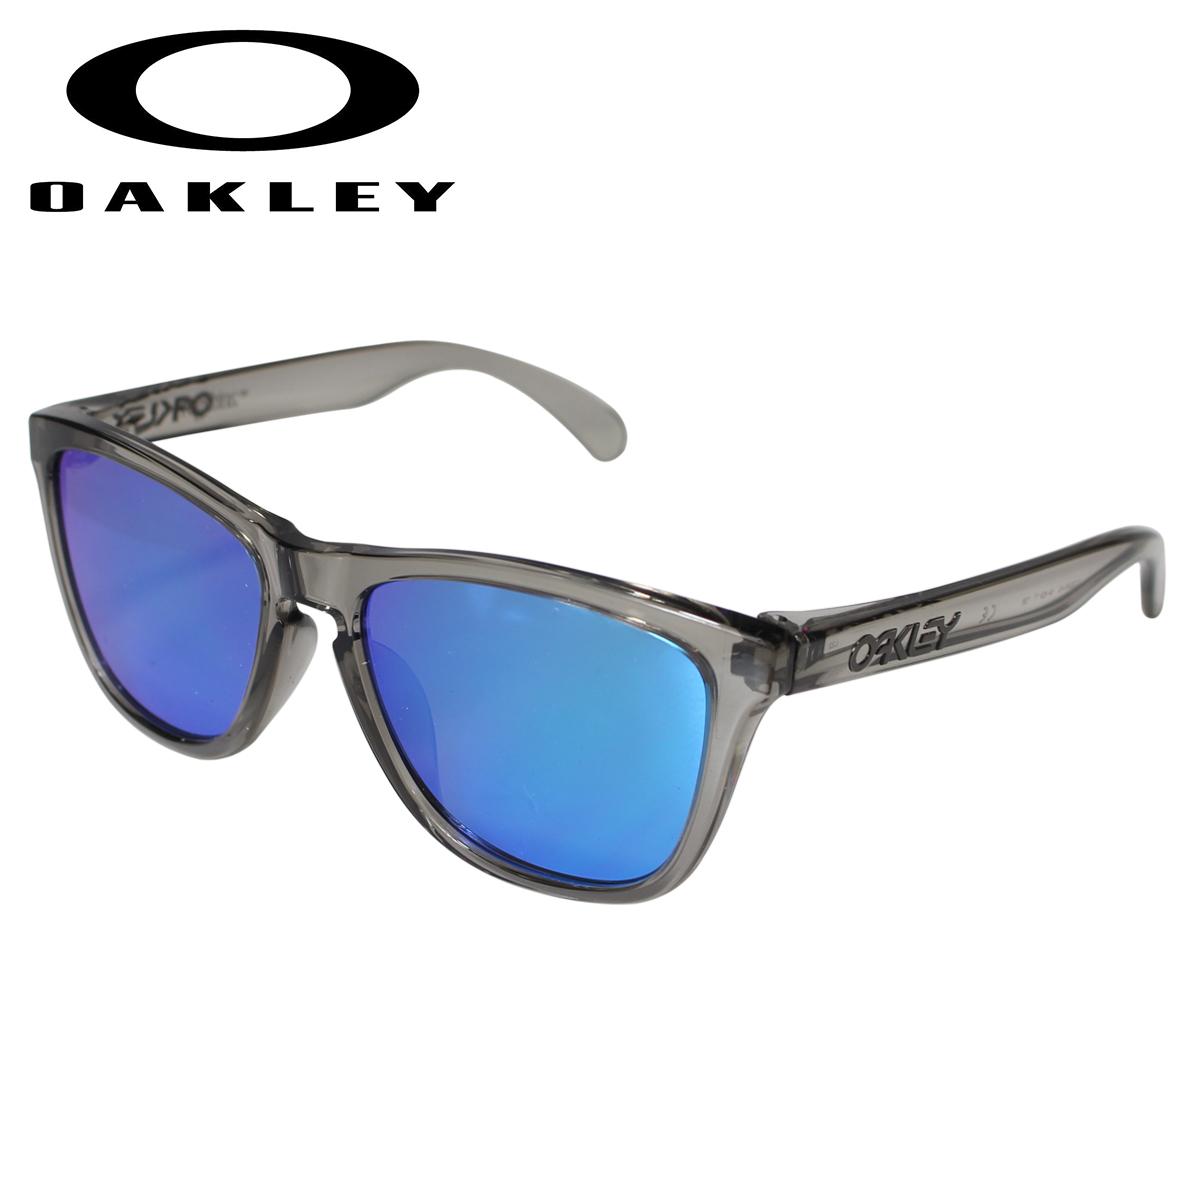 Oakley Frogskins オークリー サングラス フロッグスキン アジアンフィット メンズ レディース ASIA FIT グレーインク OO9245-42